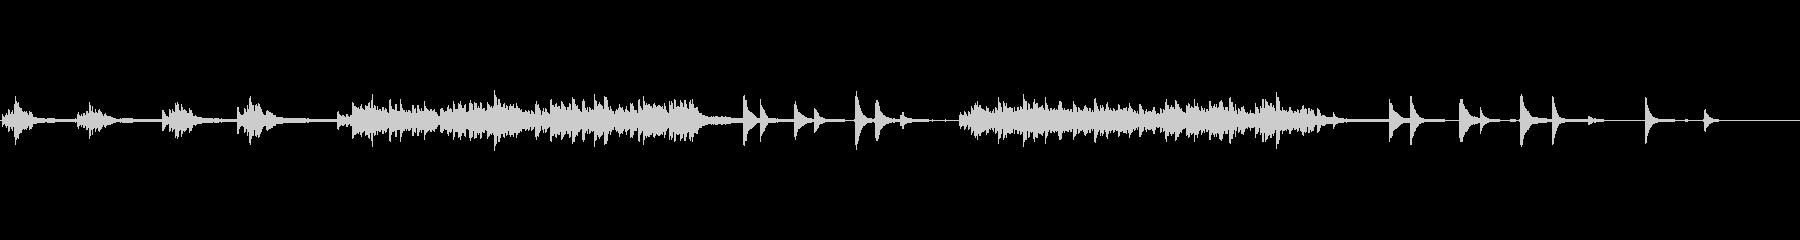 VLOG/BGM 穏やか綺麗な生ピアノの未再生の波形